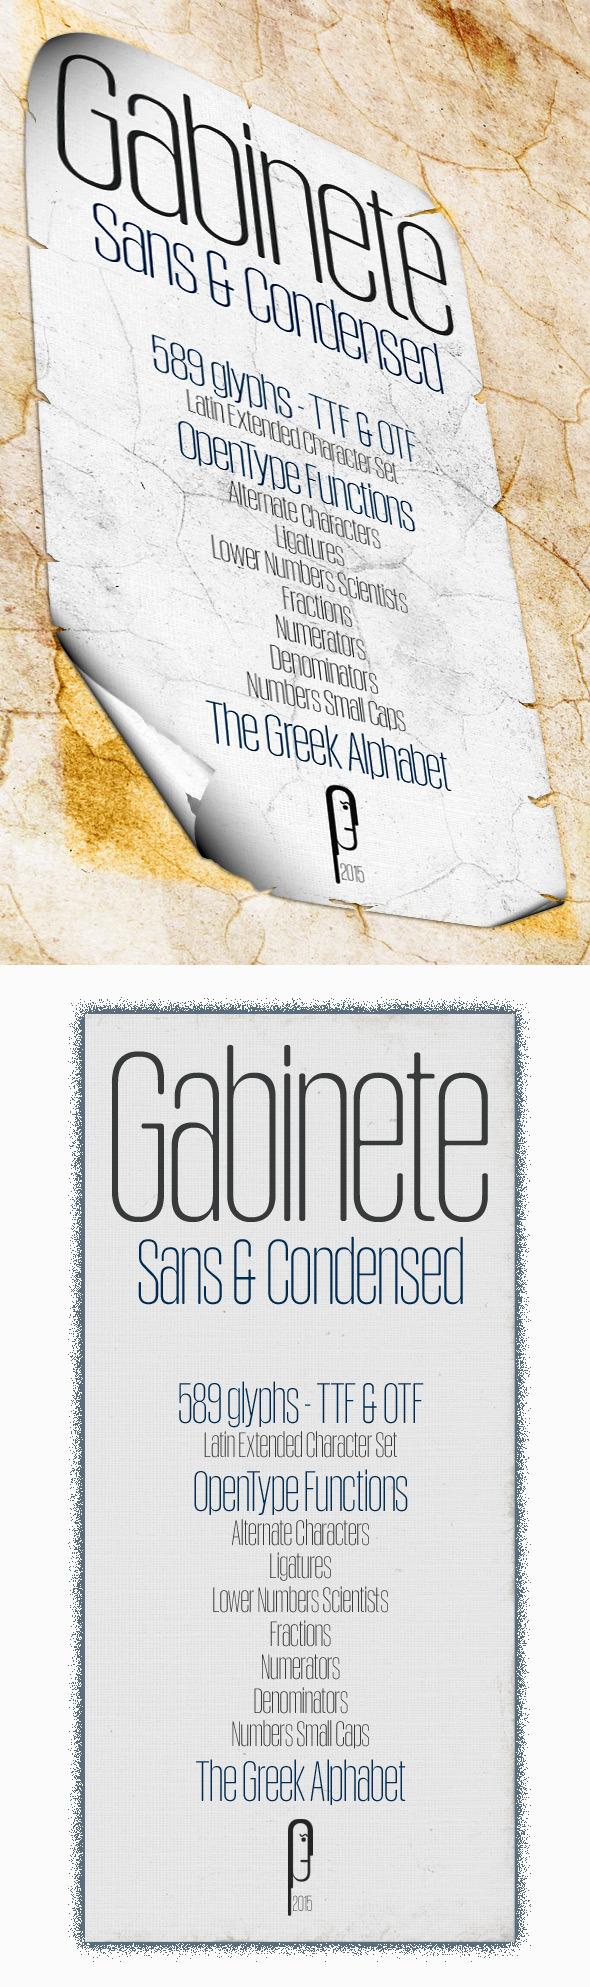 GraphicRiver Gabinete Sans Condensed 11438134